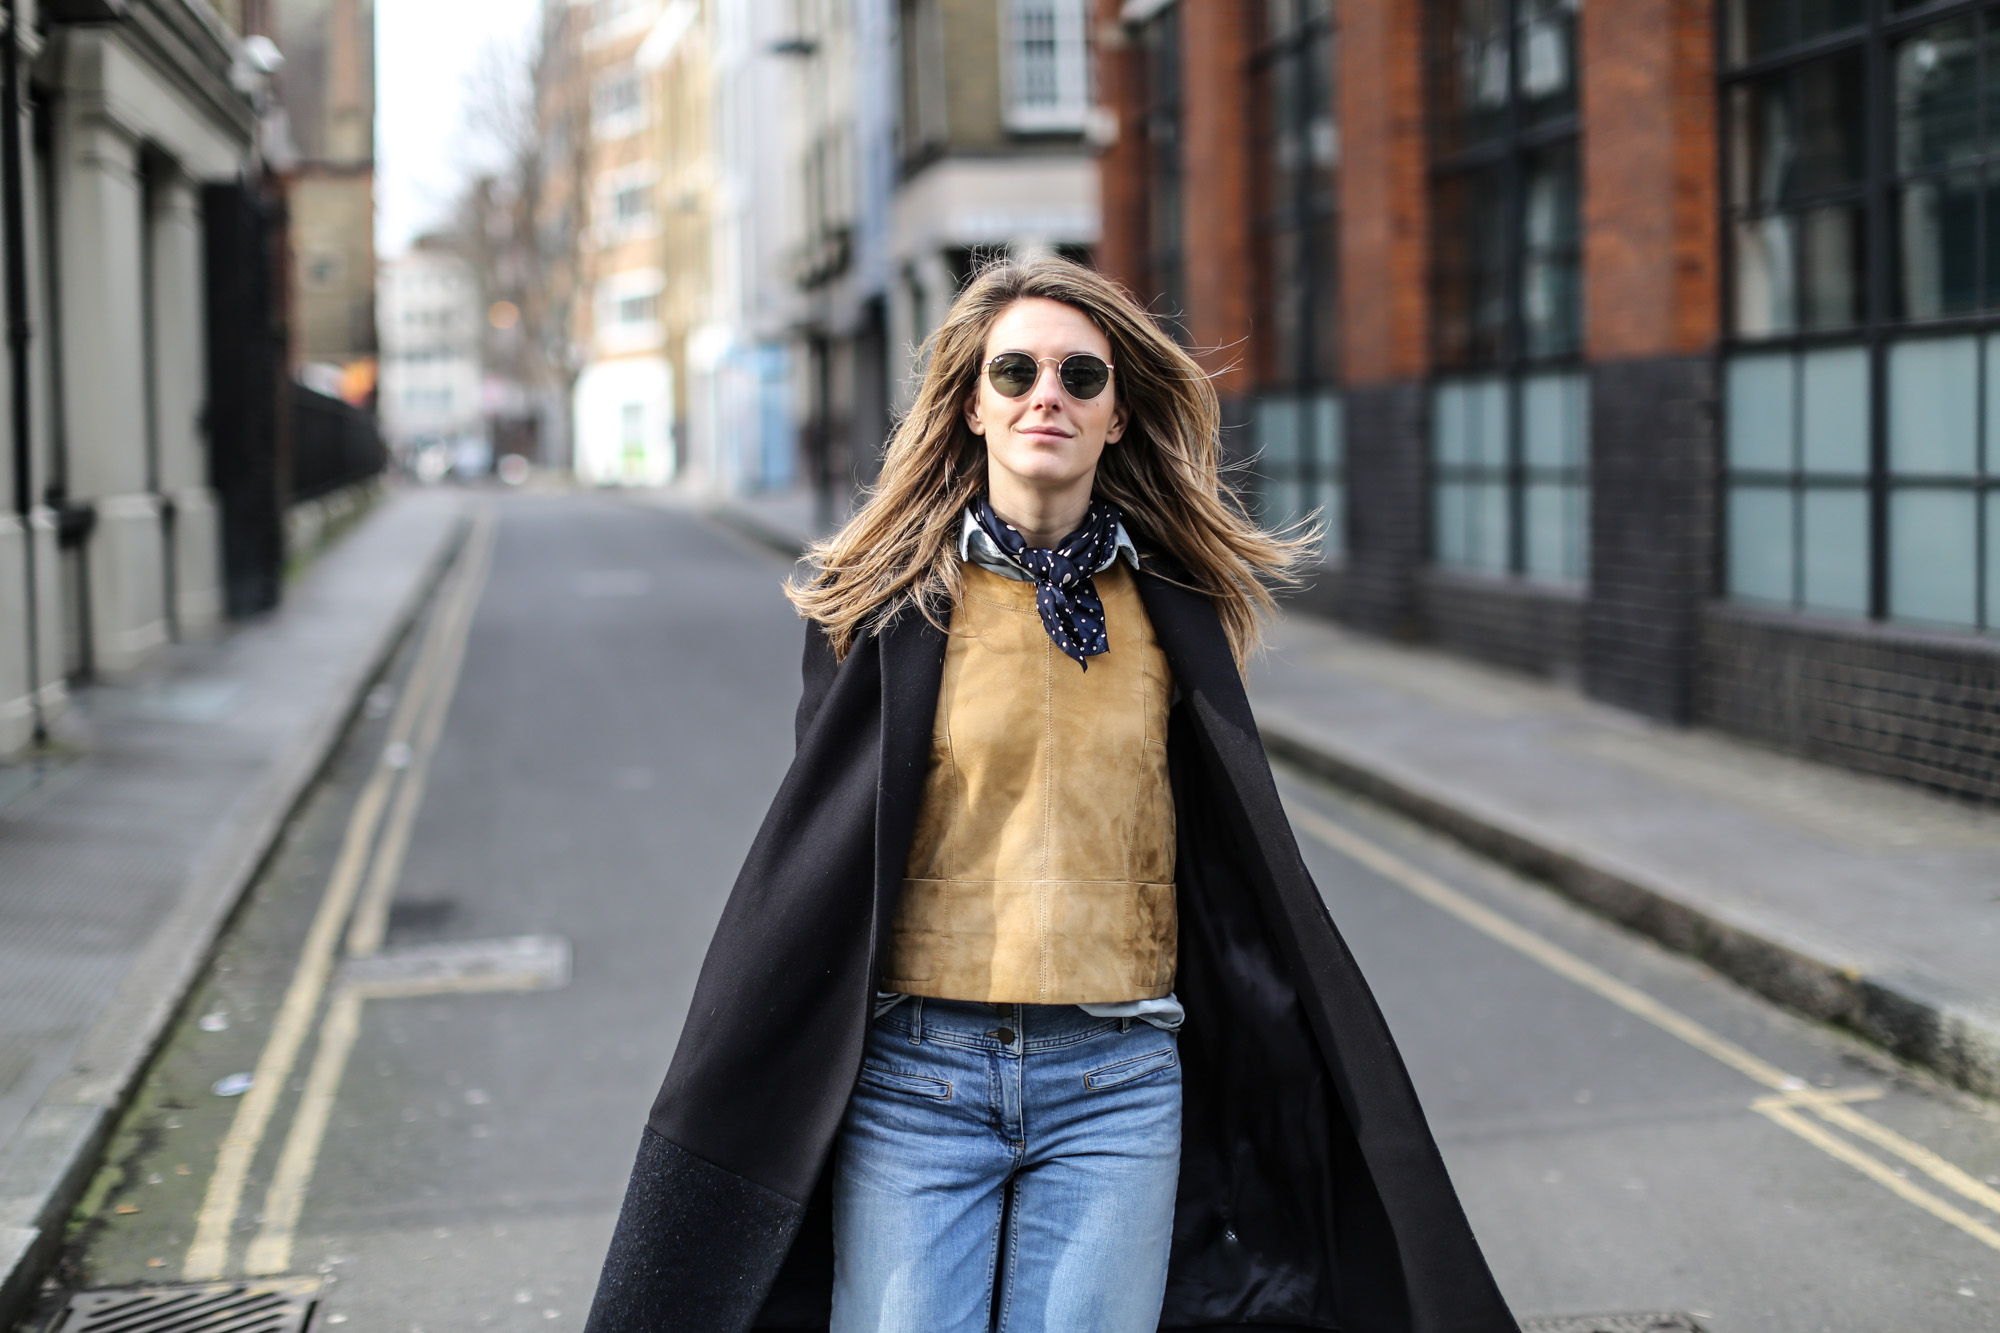 Clochet-wide-retro-jeans-suede-top-cos-coat-10